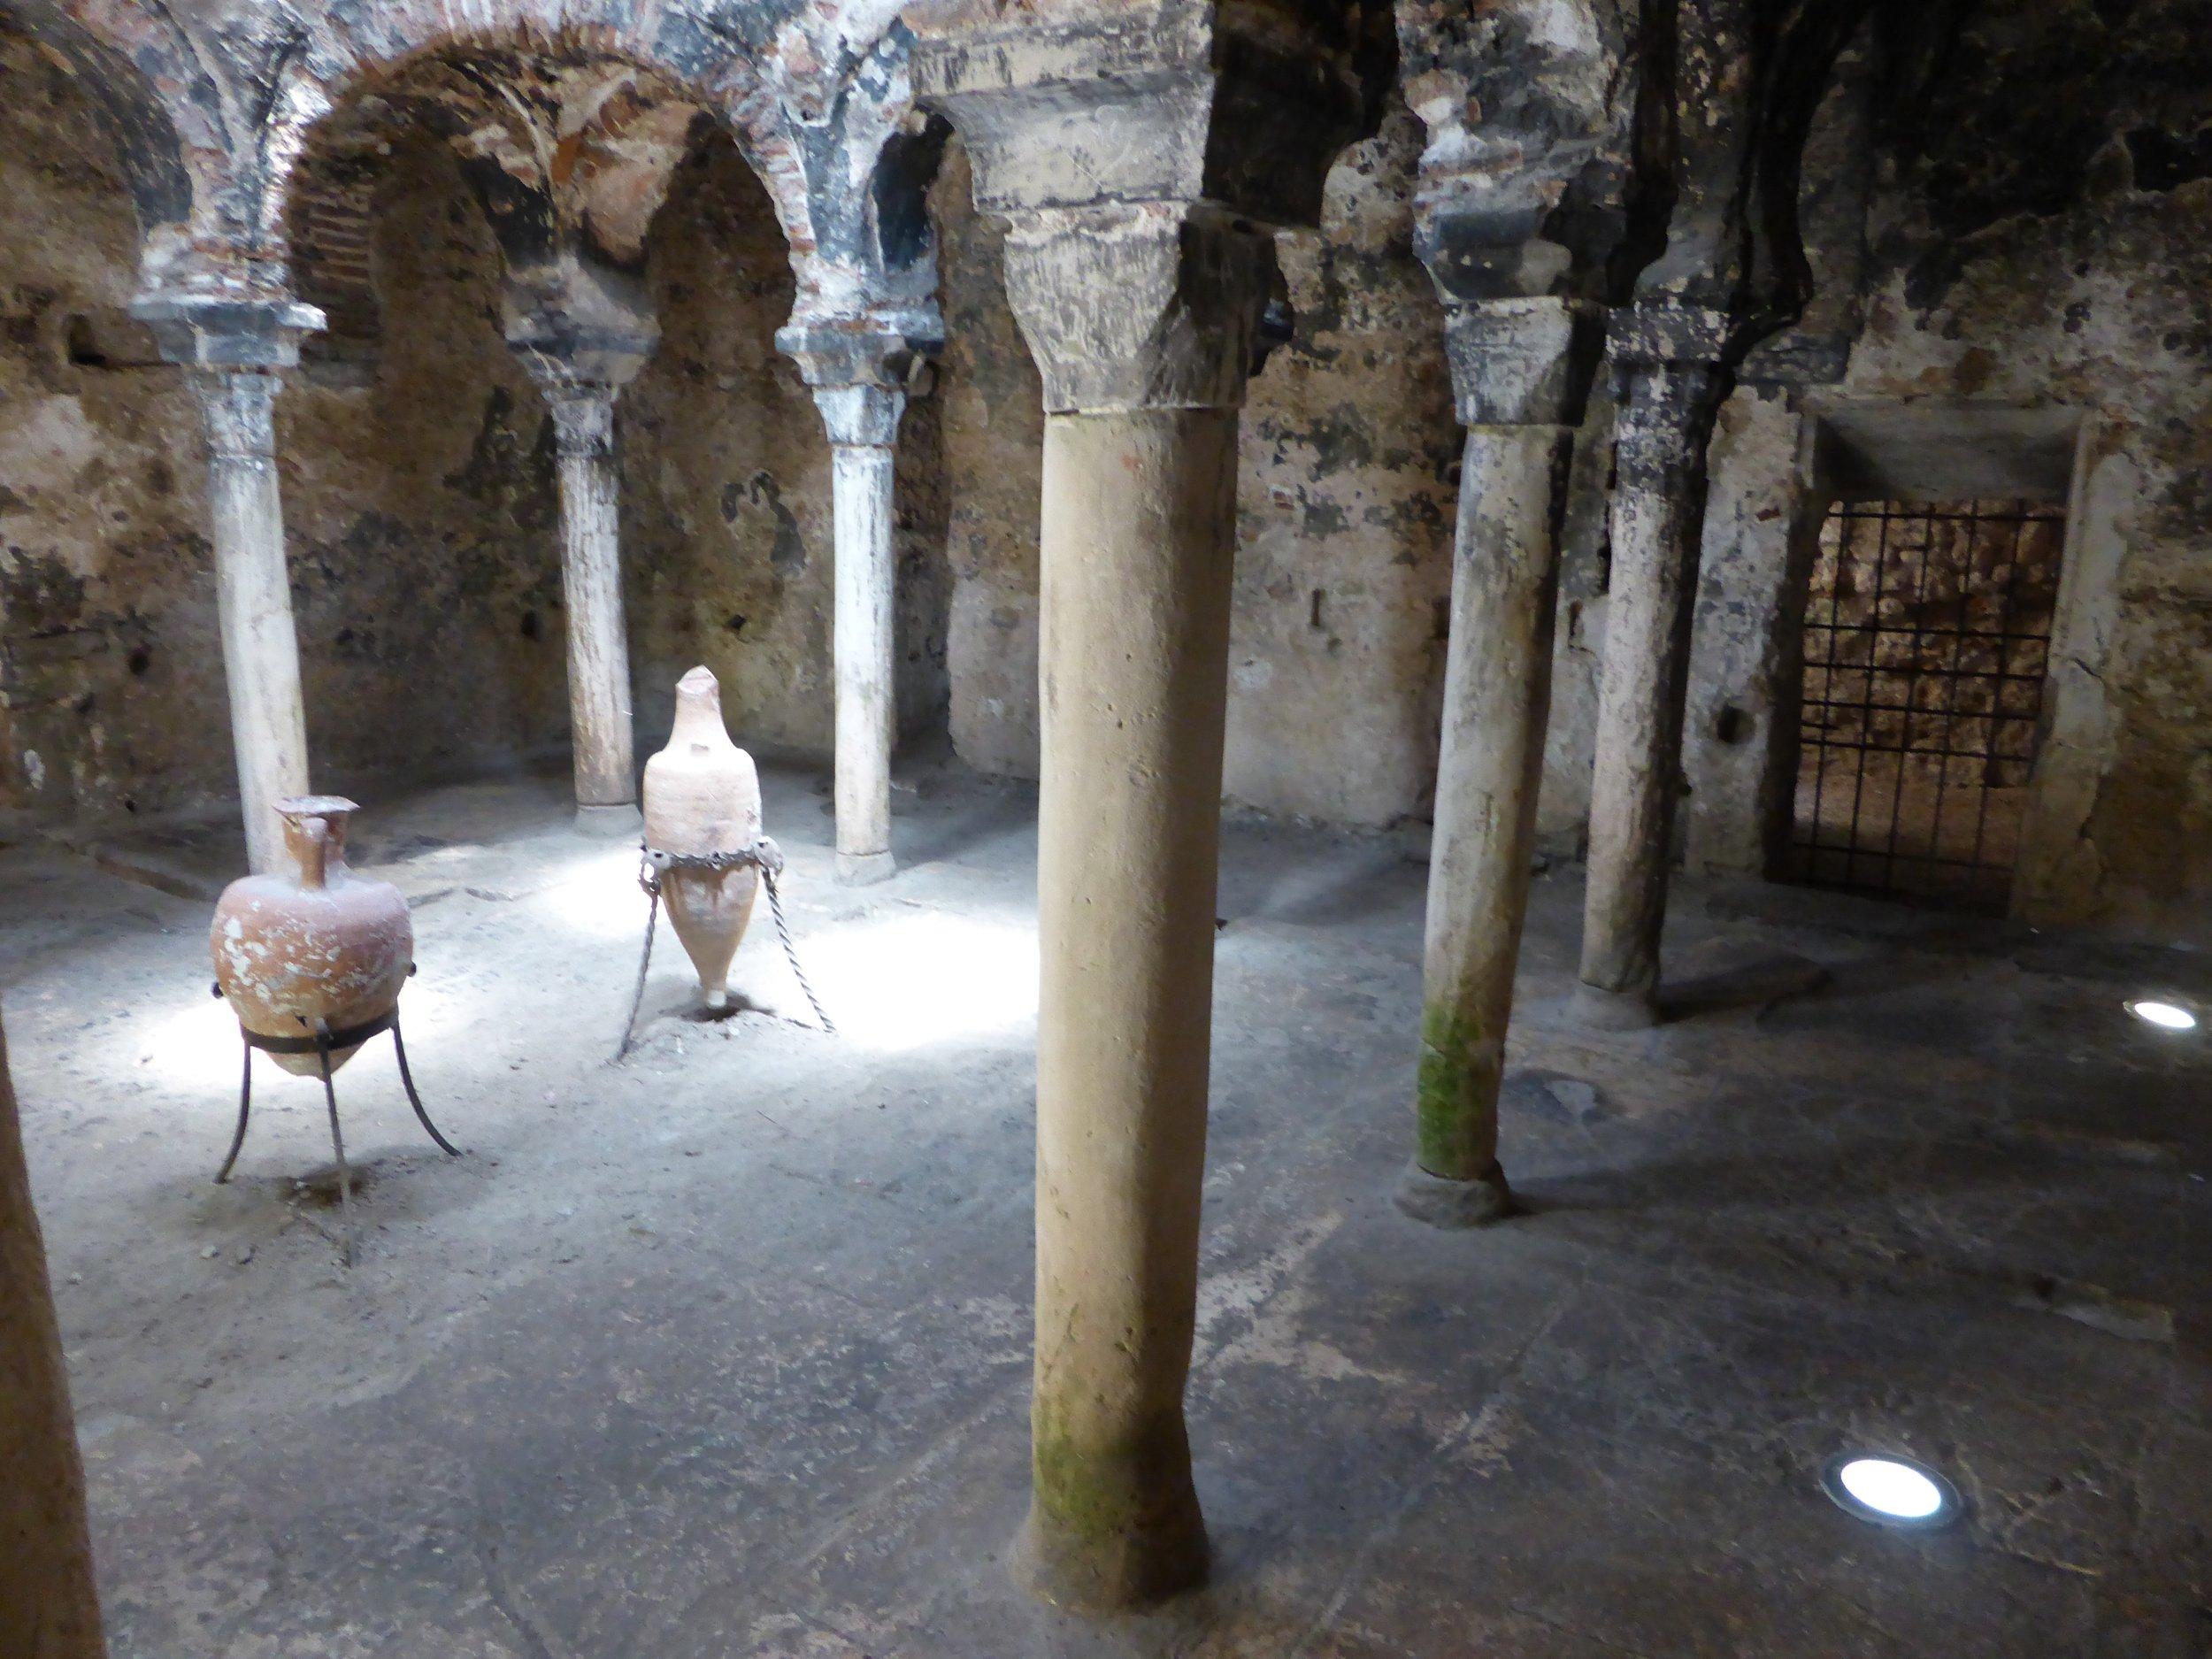 Palma city. Arabic baths 11th c. Very atmospheric.